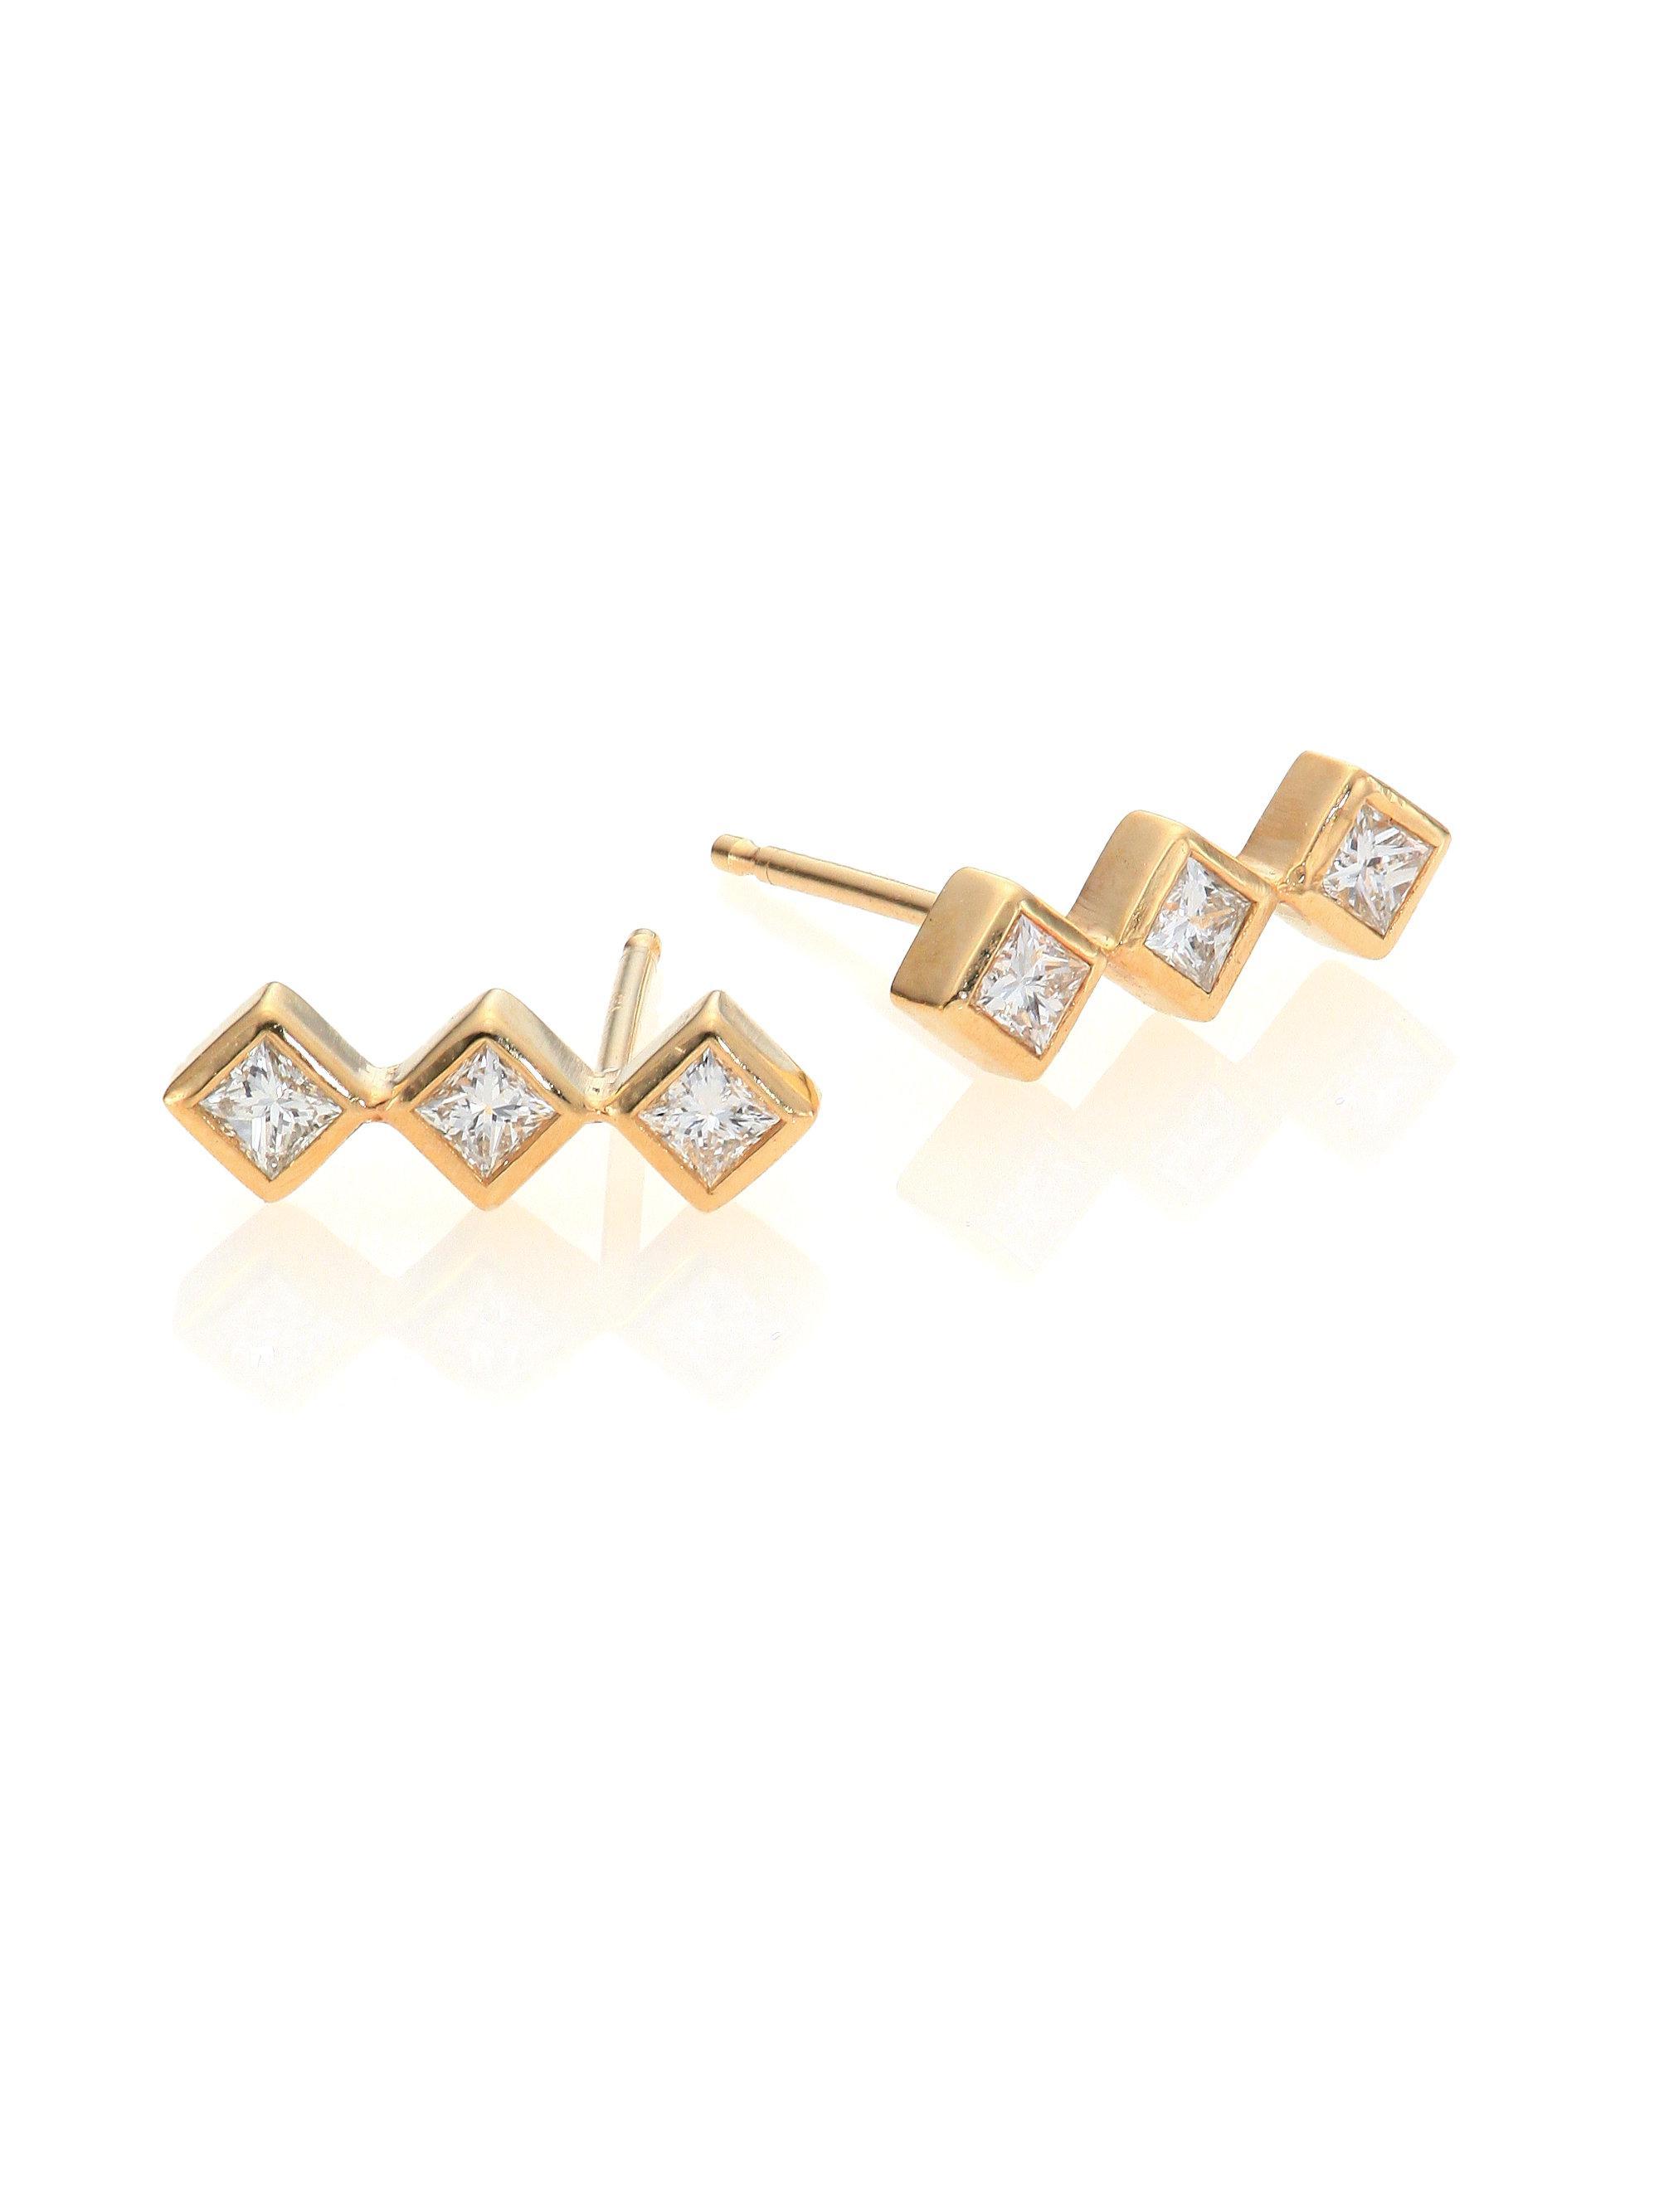 ceb1499d21ad3 Lyst - Zoe Chicco Diamond & 14k Yellow Gold Princess Stud Earrings ...